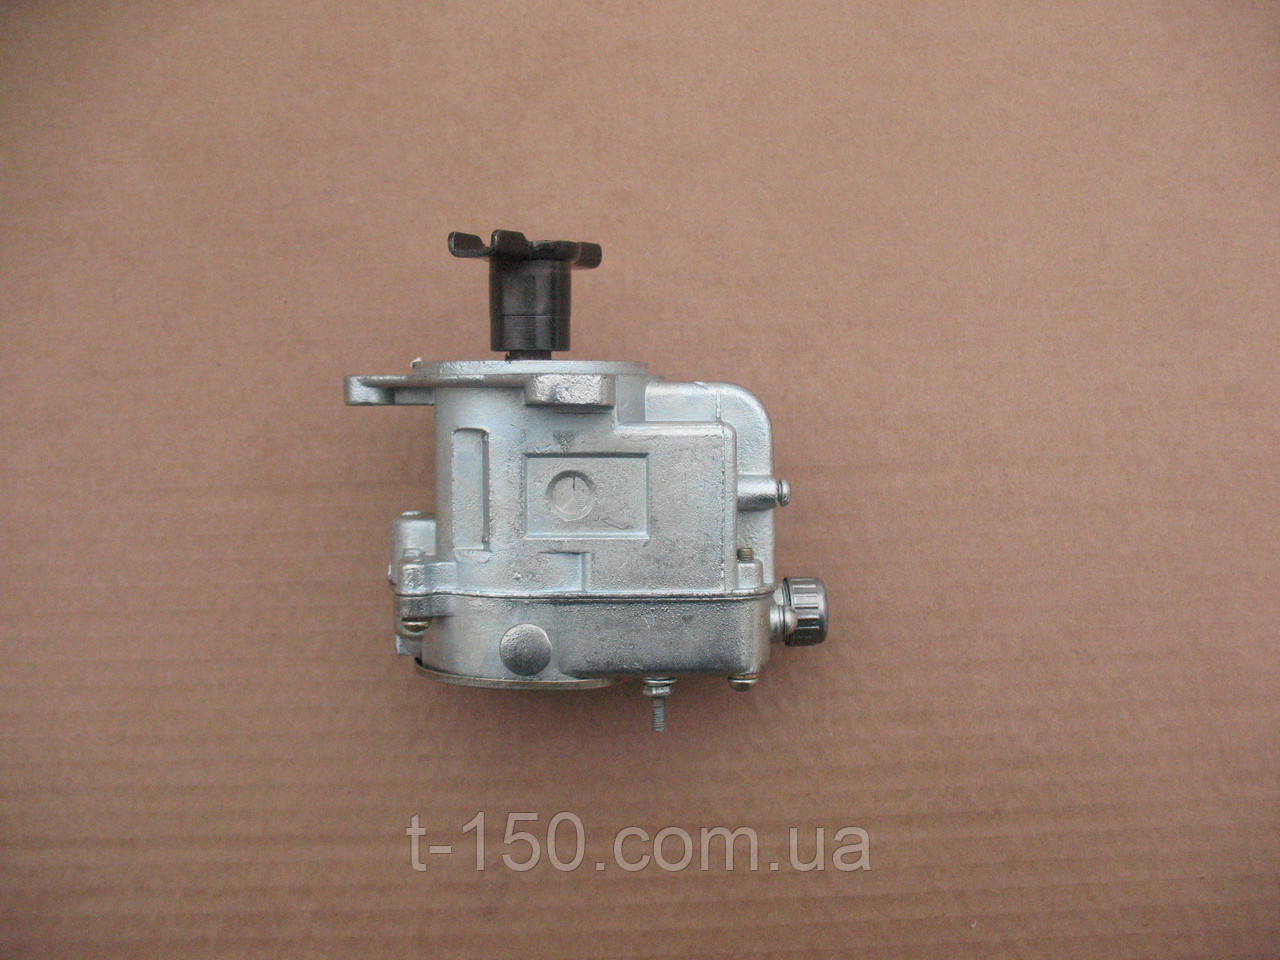 Магнето М124 контакное СССР (М124Б1-3728000)